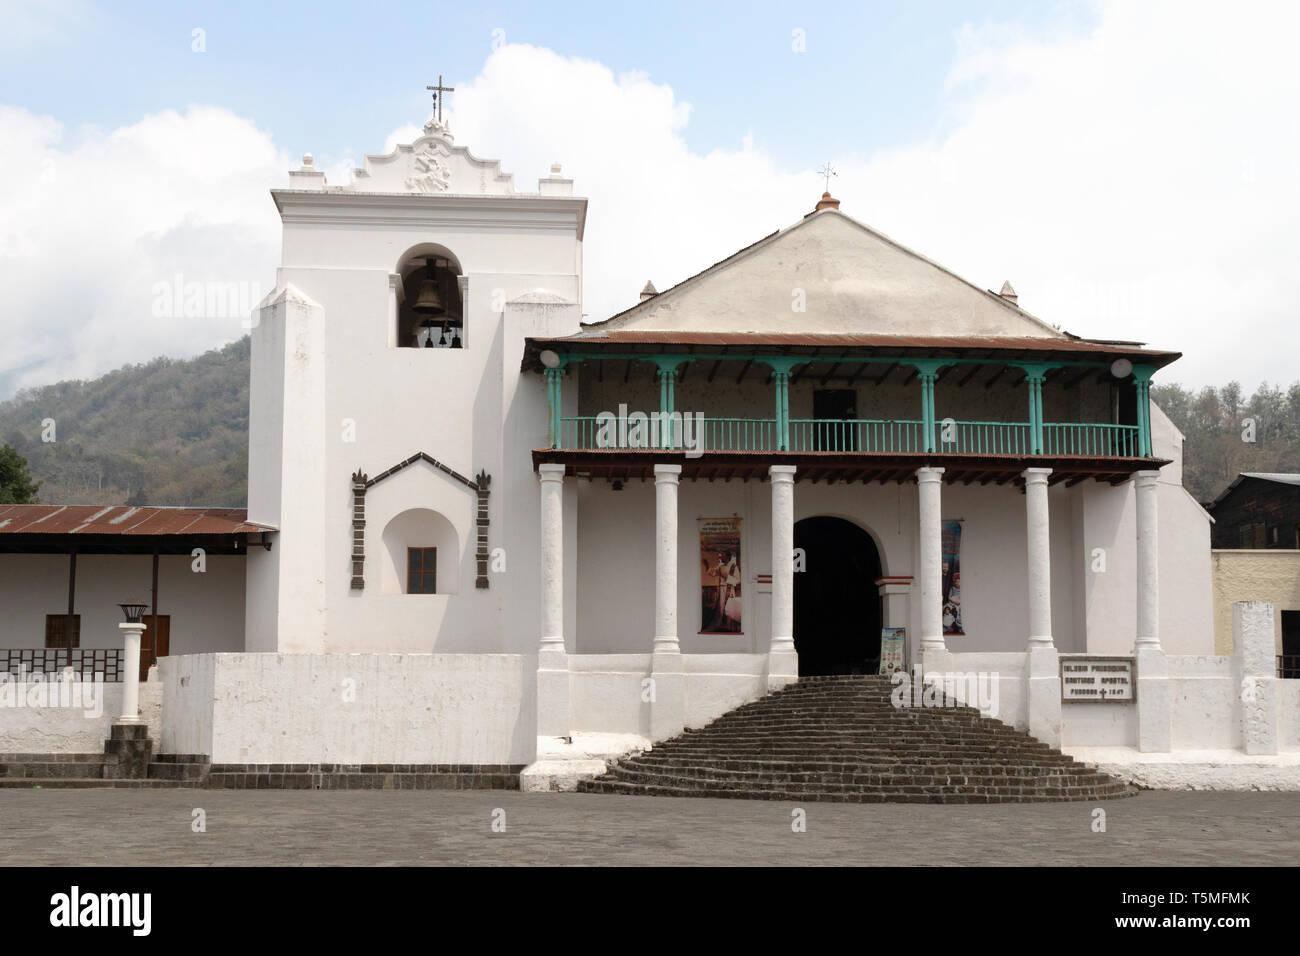 Saint James the Apostle church, Santiago Atitlan, Guatemala, Central America - Stock Image